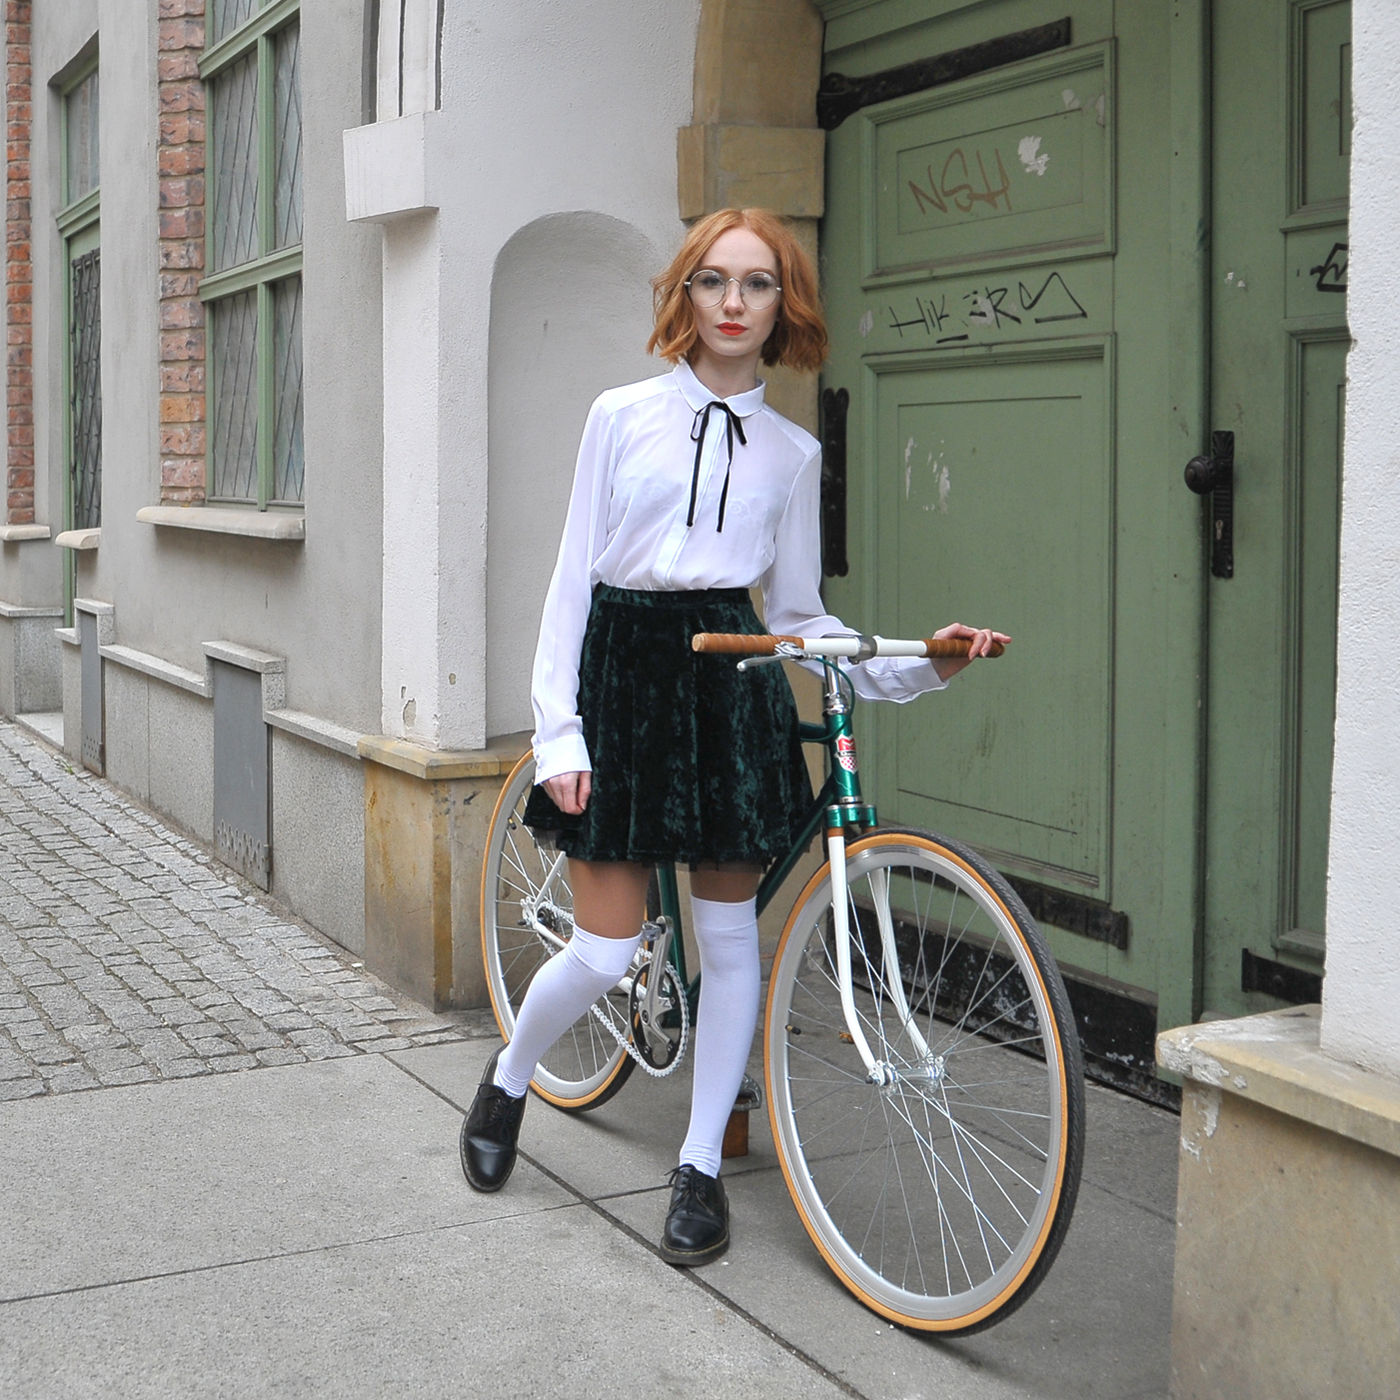 http://idabebe.blogspot.com/2017/04/retro-bike_12.html#more